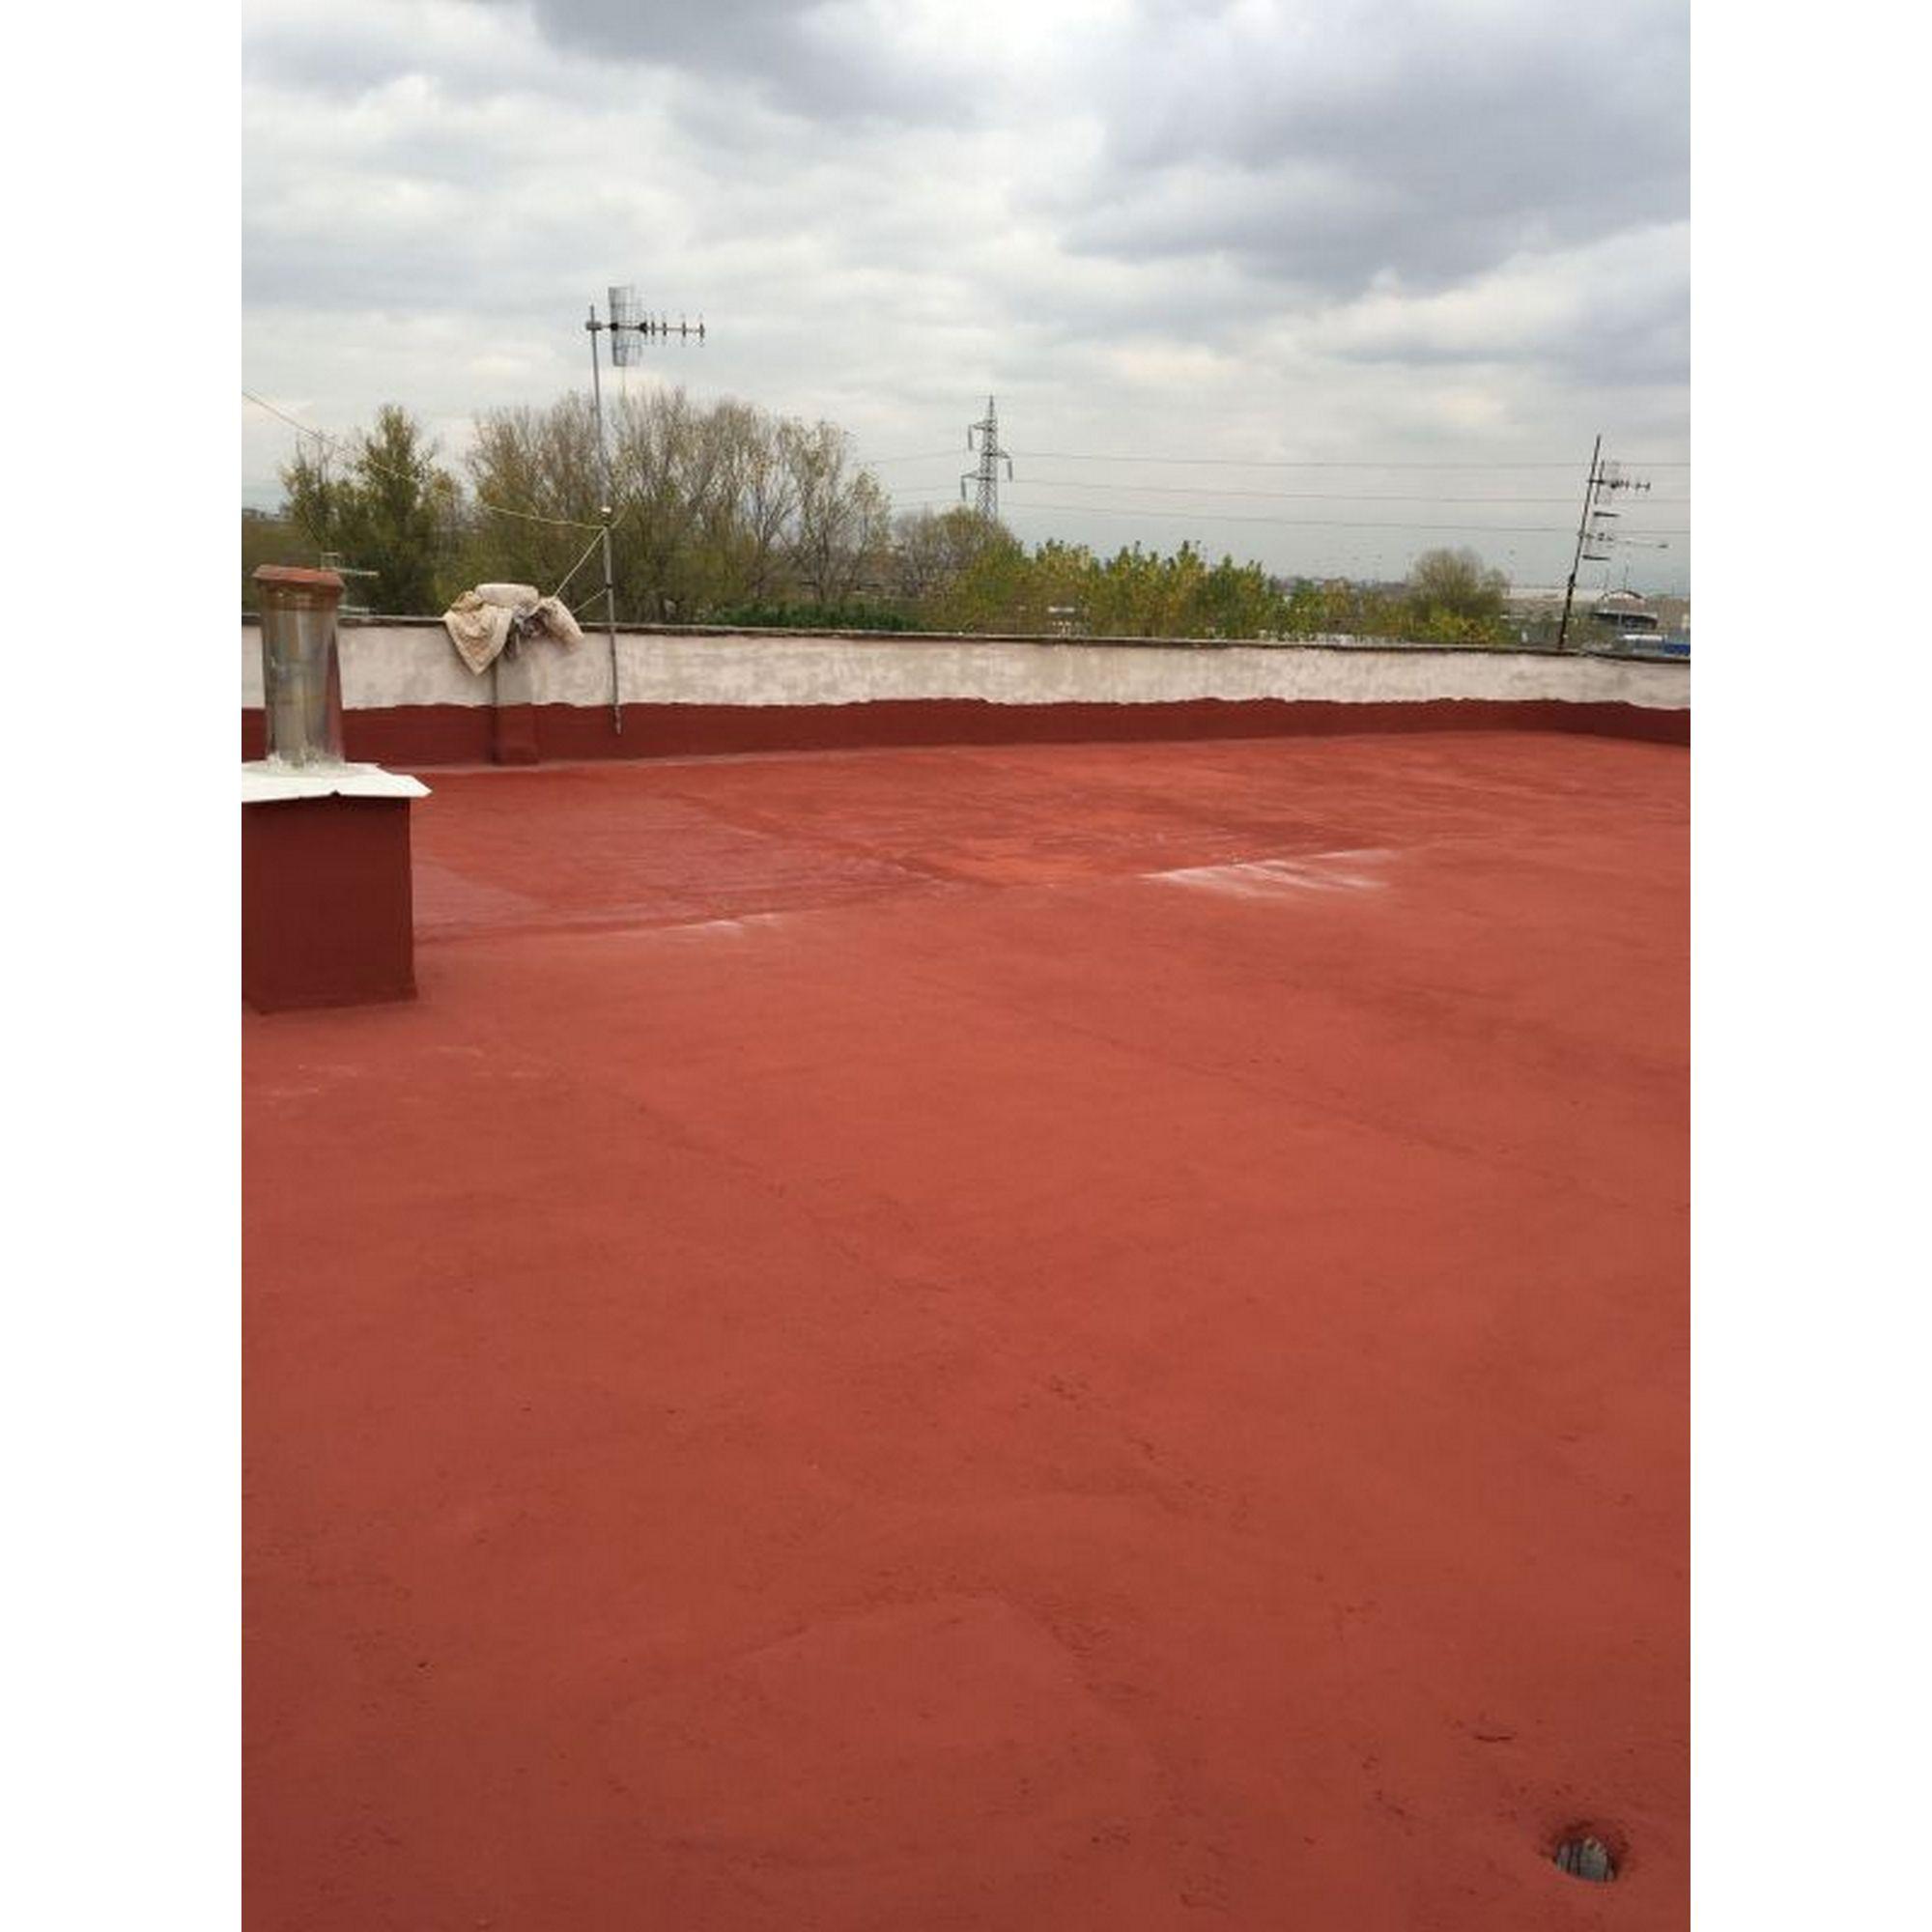 Guaina Liquida Impermeabile Rossa Da 2 5 L Callegari Vernici